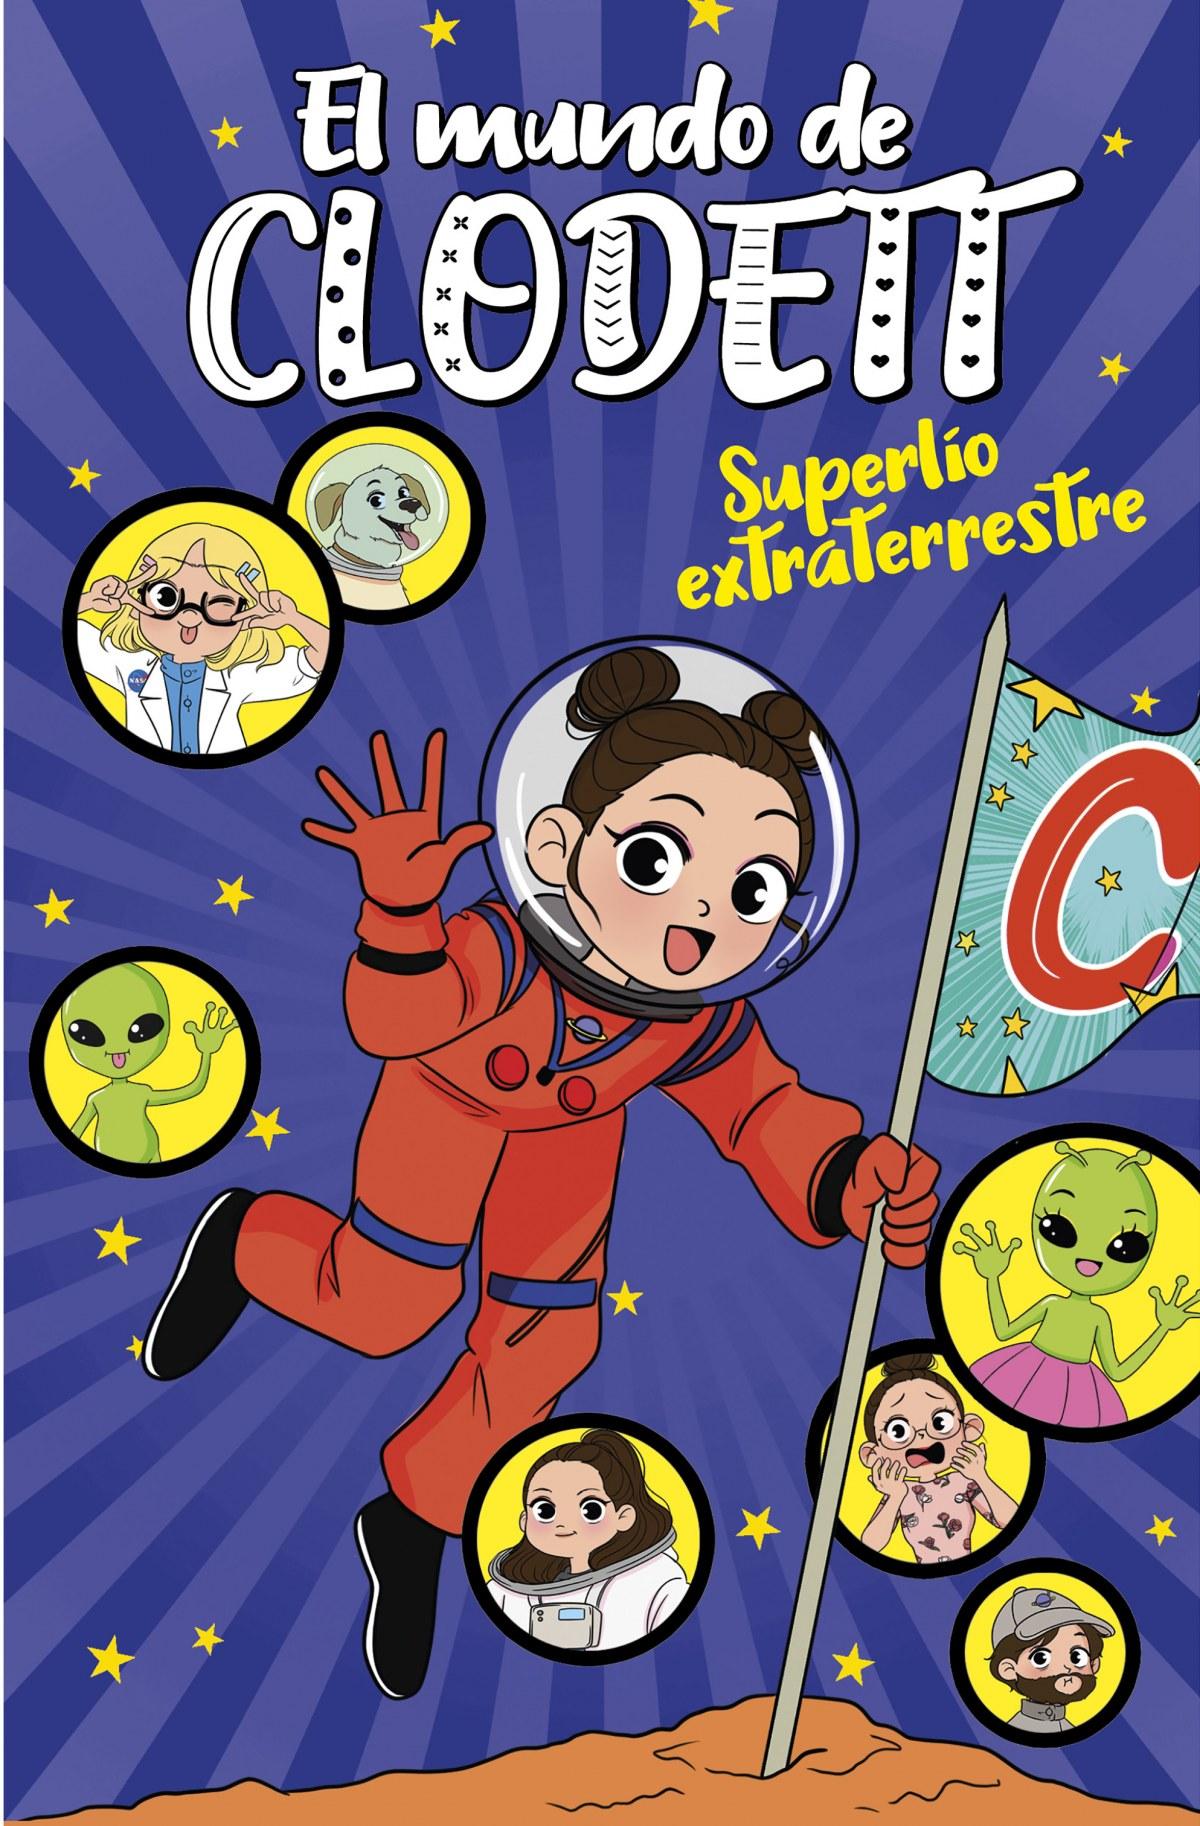 Superl¡o extraterrestre (El mundo de Clodett 6) 9788418038761